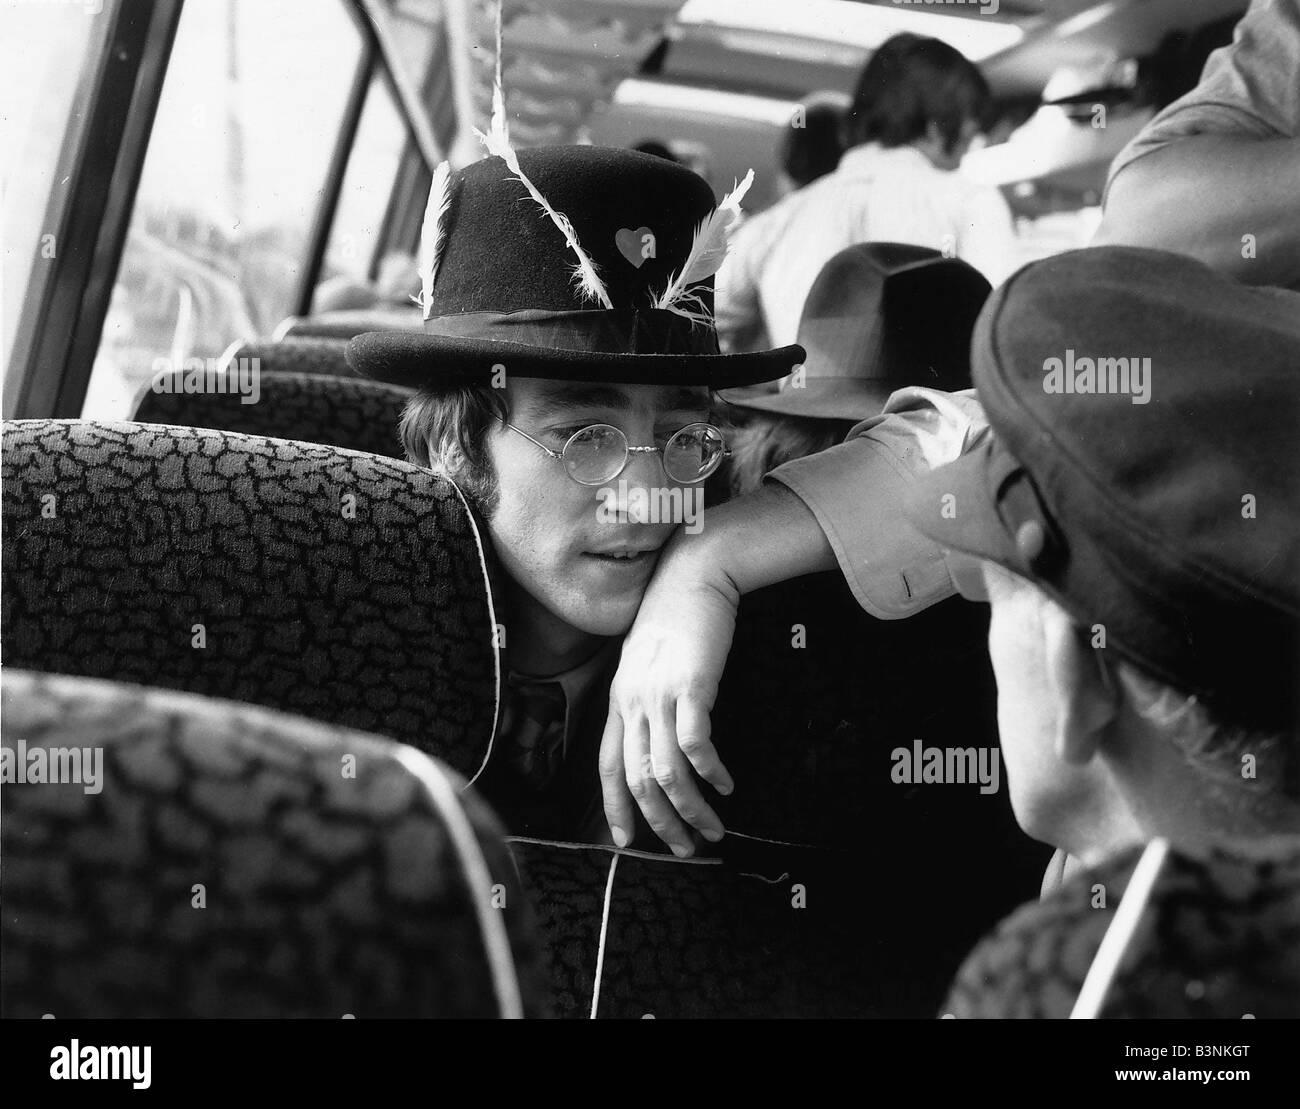 Beatles Pop Group Band Member John Lennon Talking To A Friend On The Coach September 1967 - Stock Image